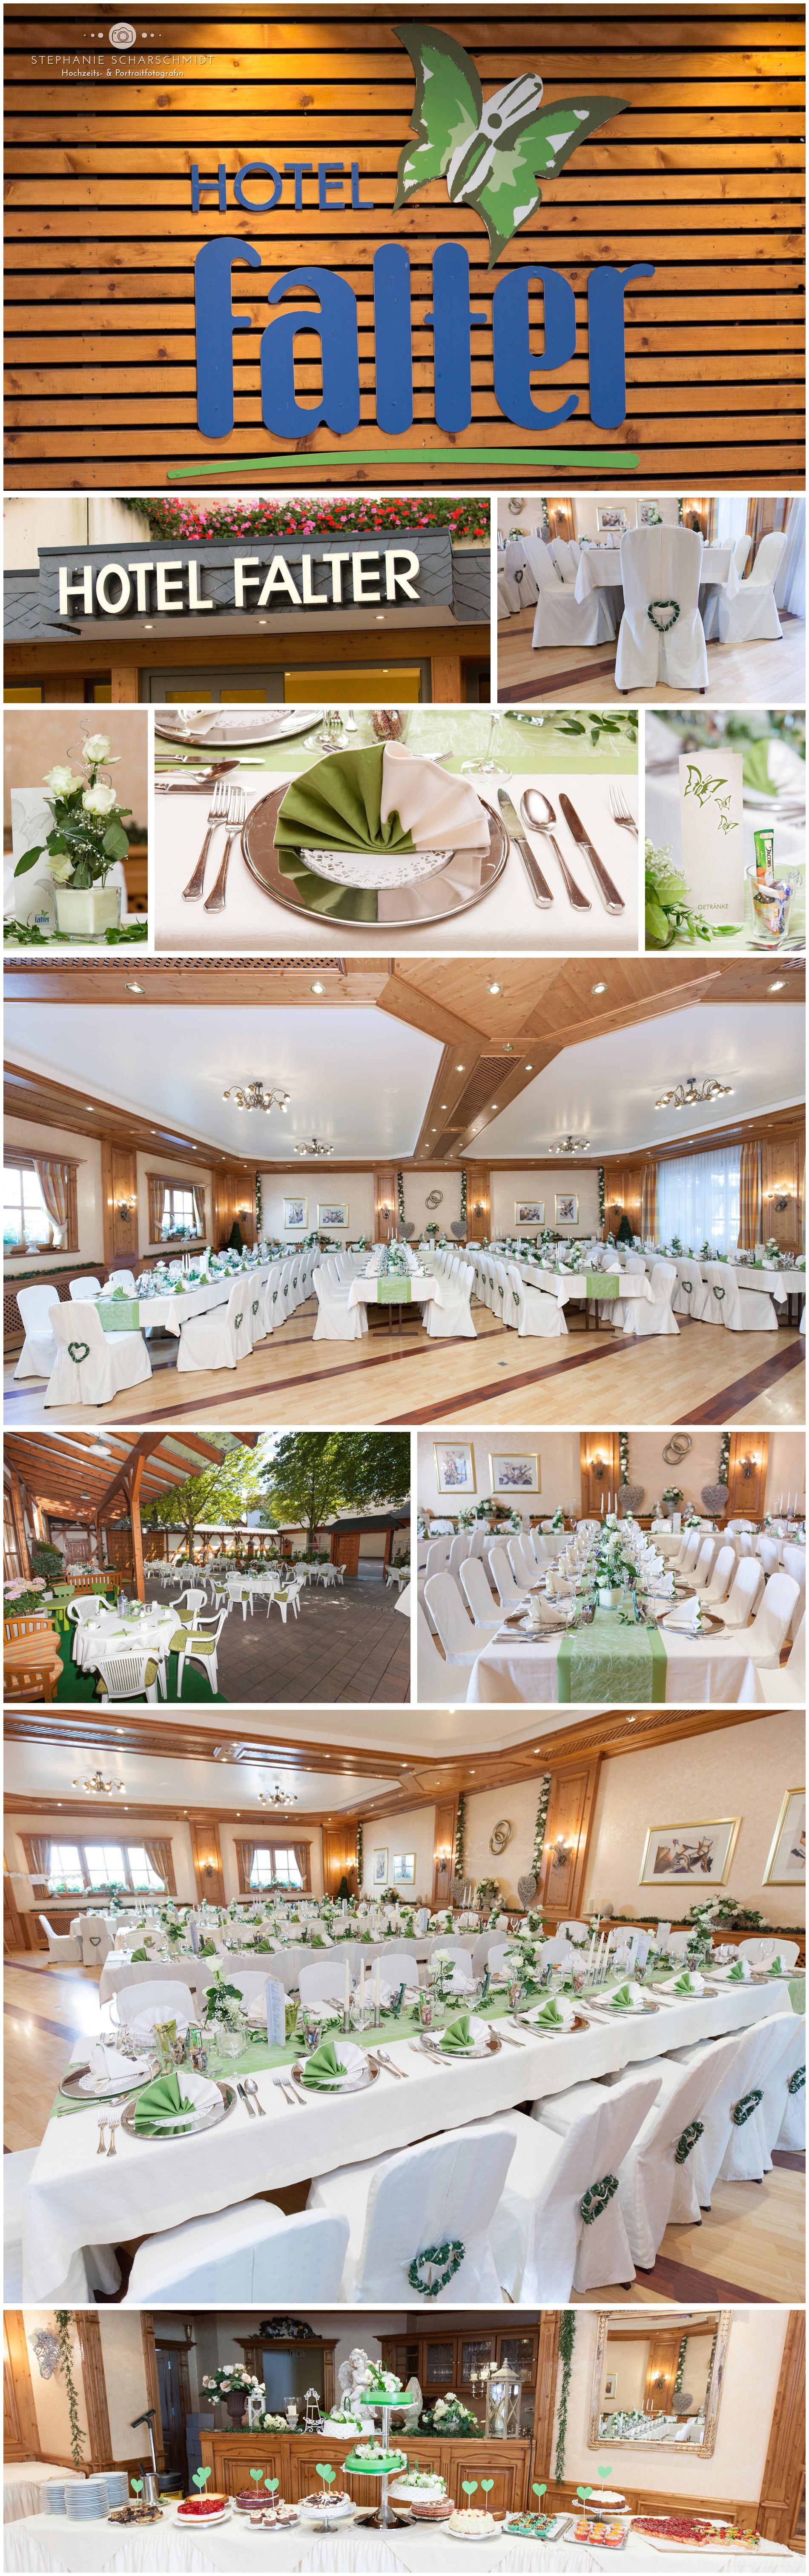 Festsaal Hotel Falter in Hof – Stephanie Scharschmidt Hochzeitsfotograf